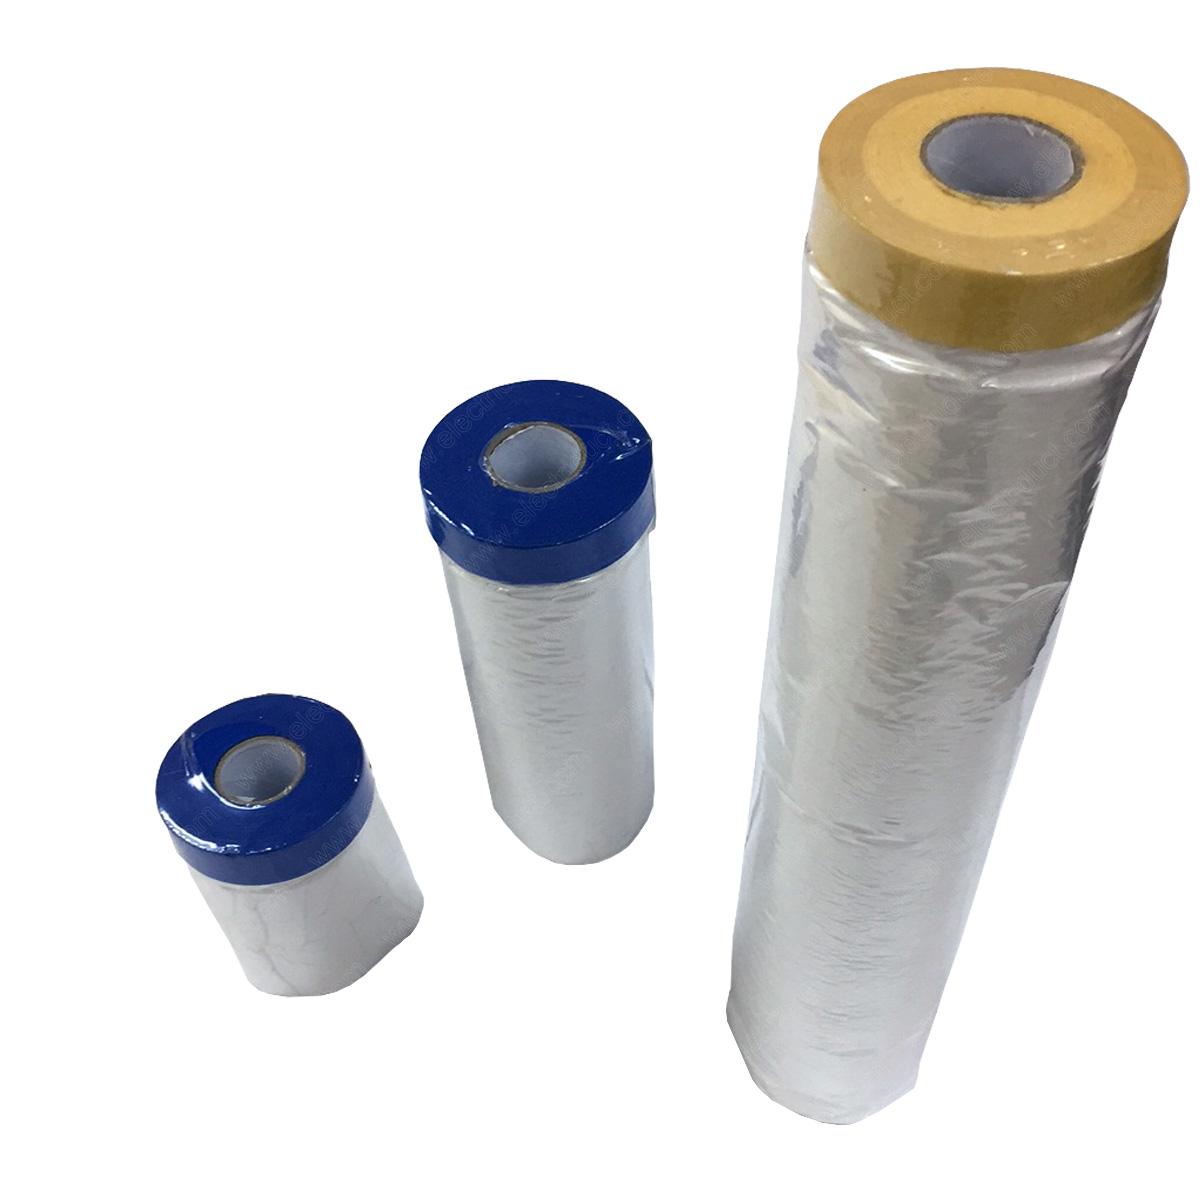 premier paint roller plastic drop cloth 9 feet by 12